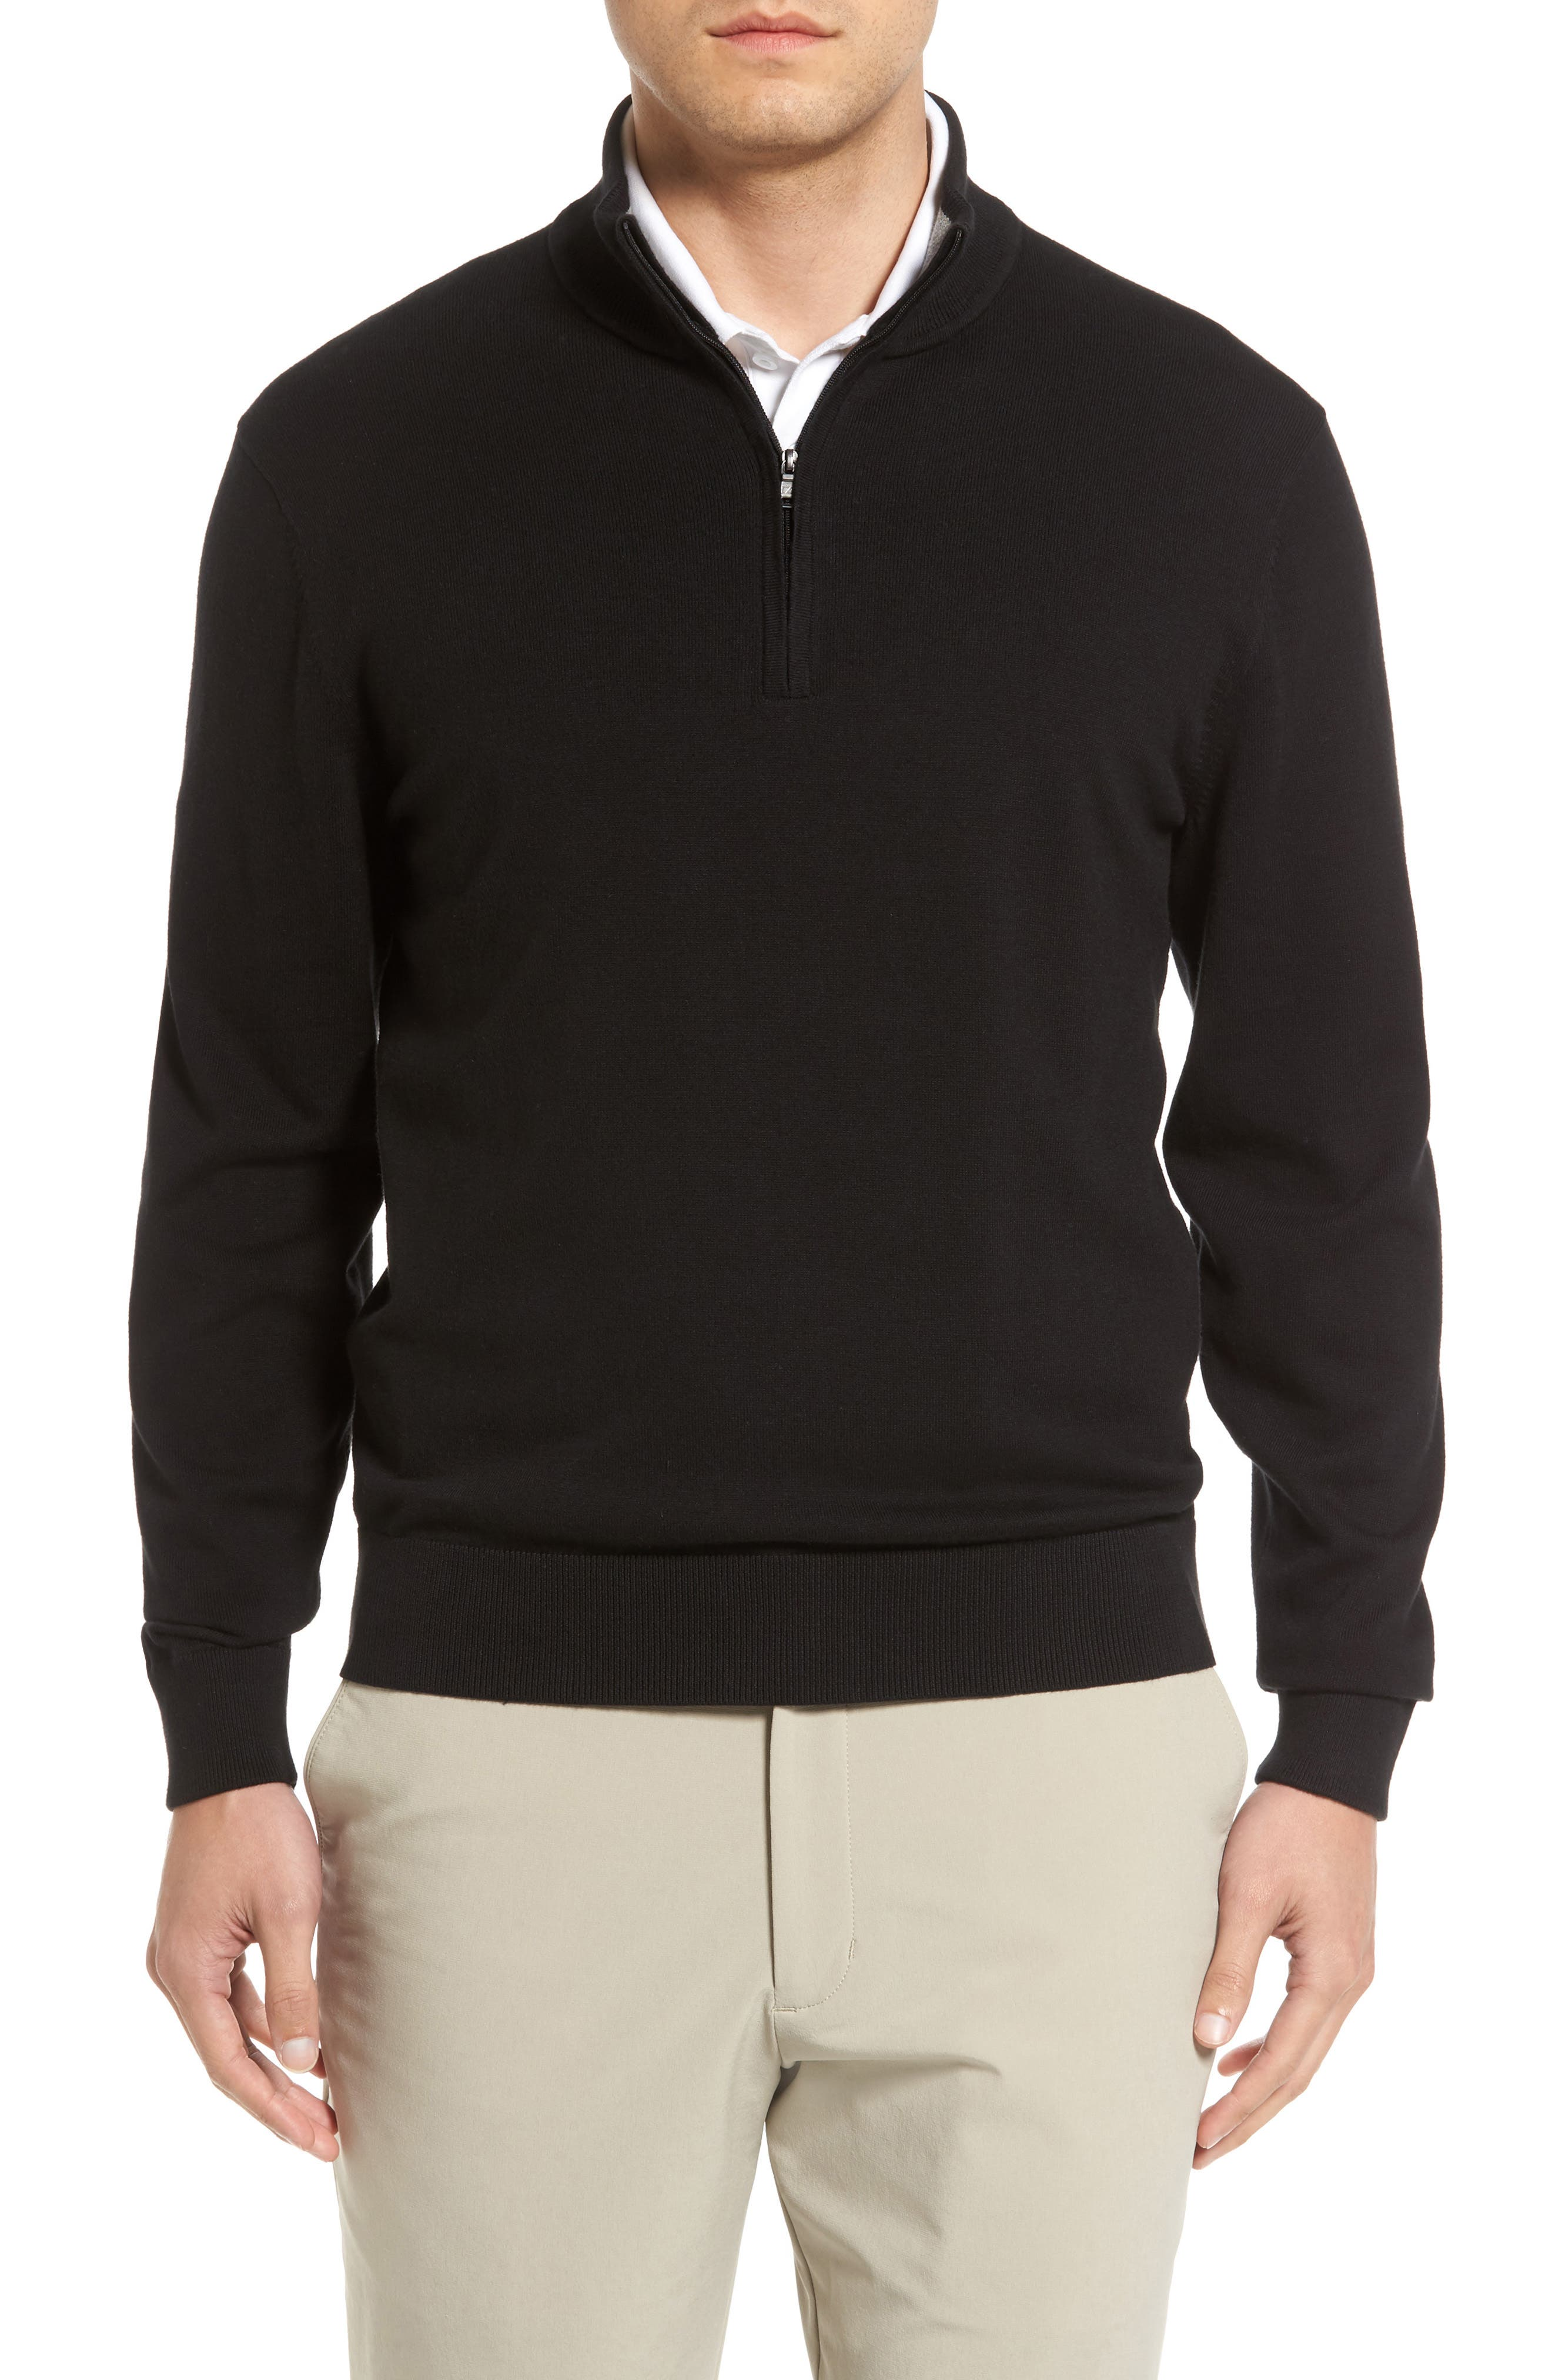 Cutter & Buck Lakemont Half Zip Sweater, Black